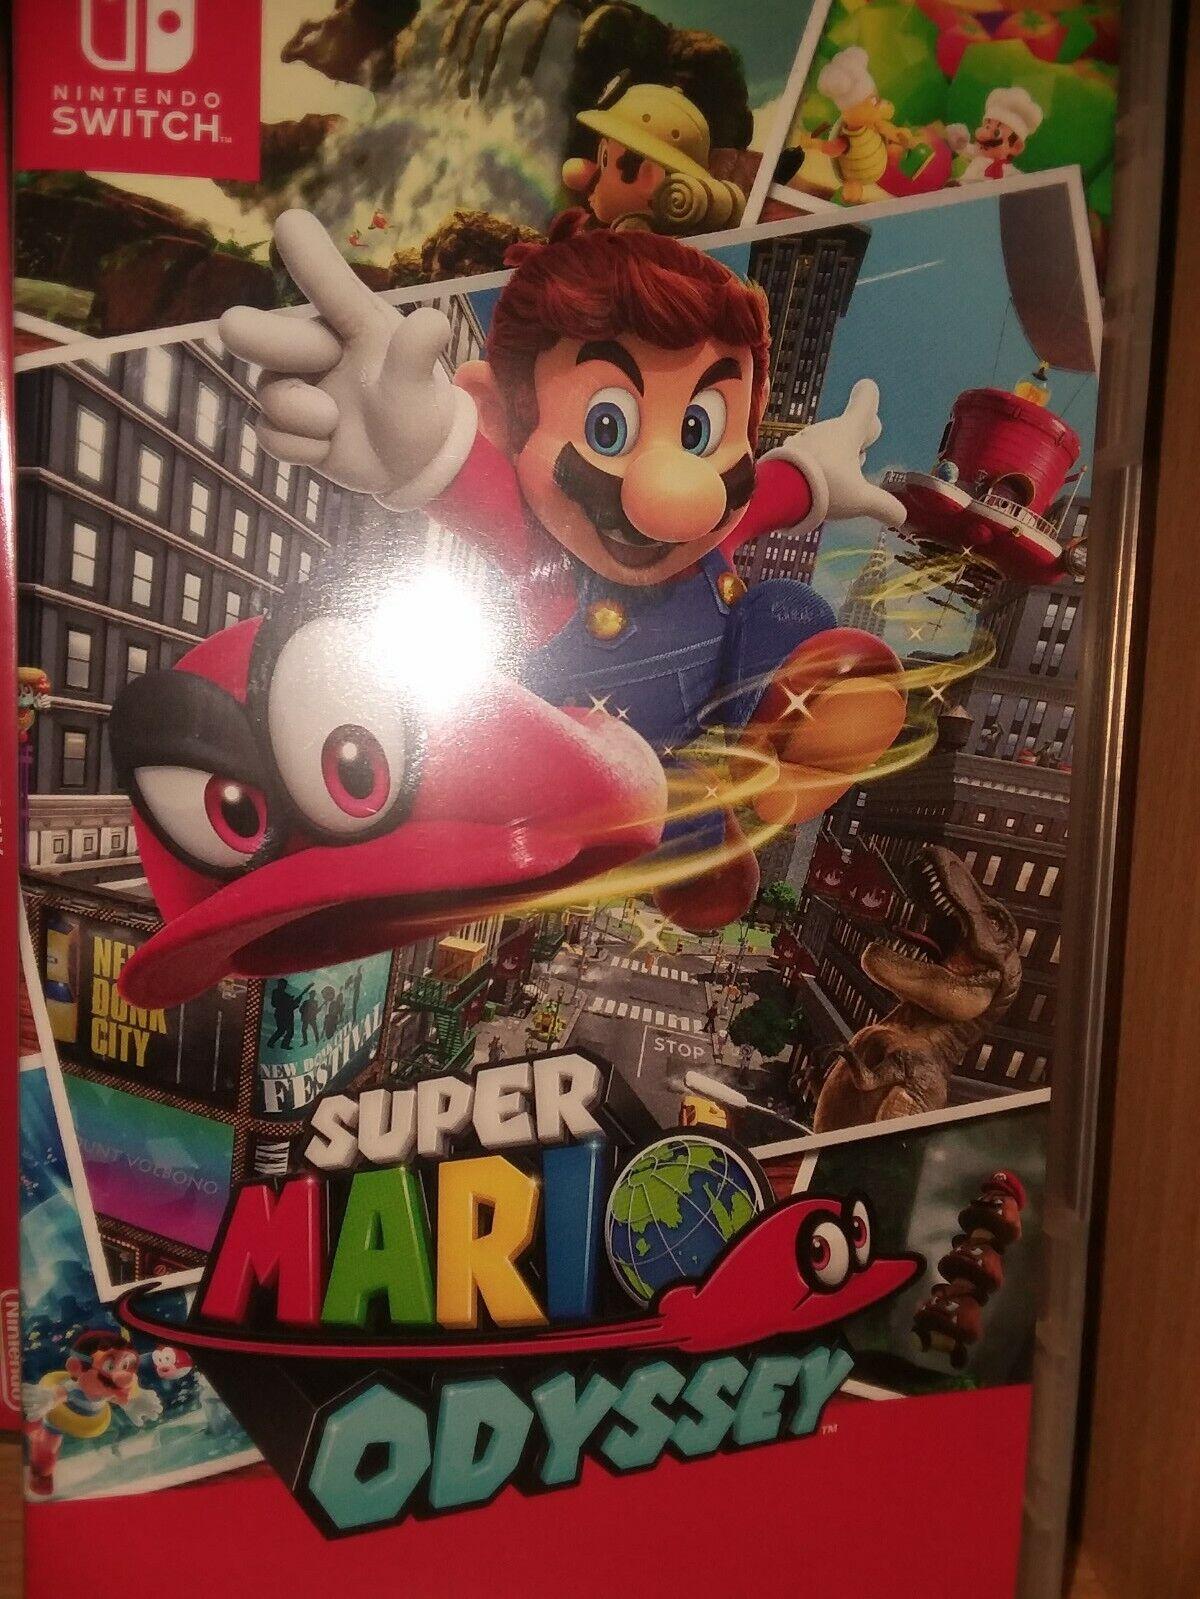 Super Mario Odyssey For Nintendo Switch, Slightly Cracked Case - $34.99